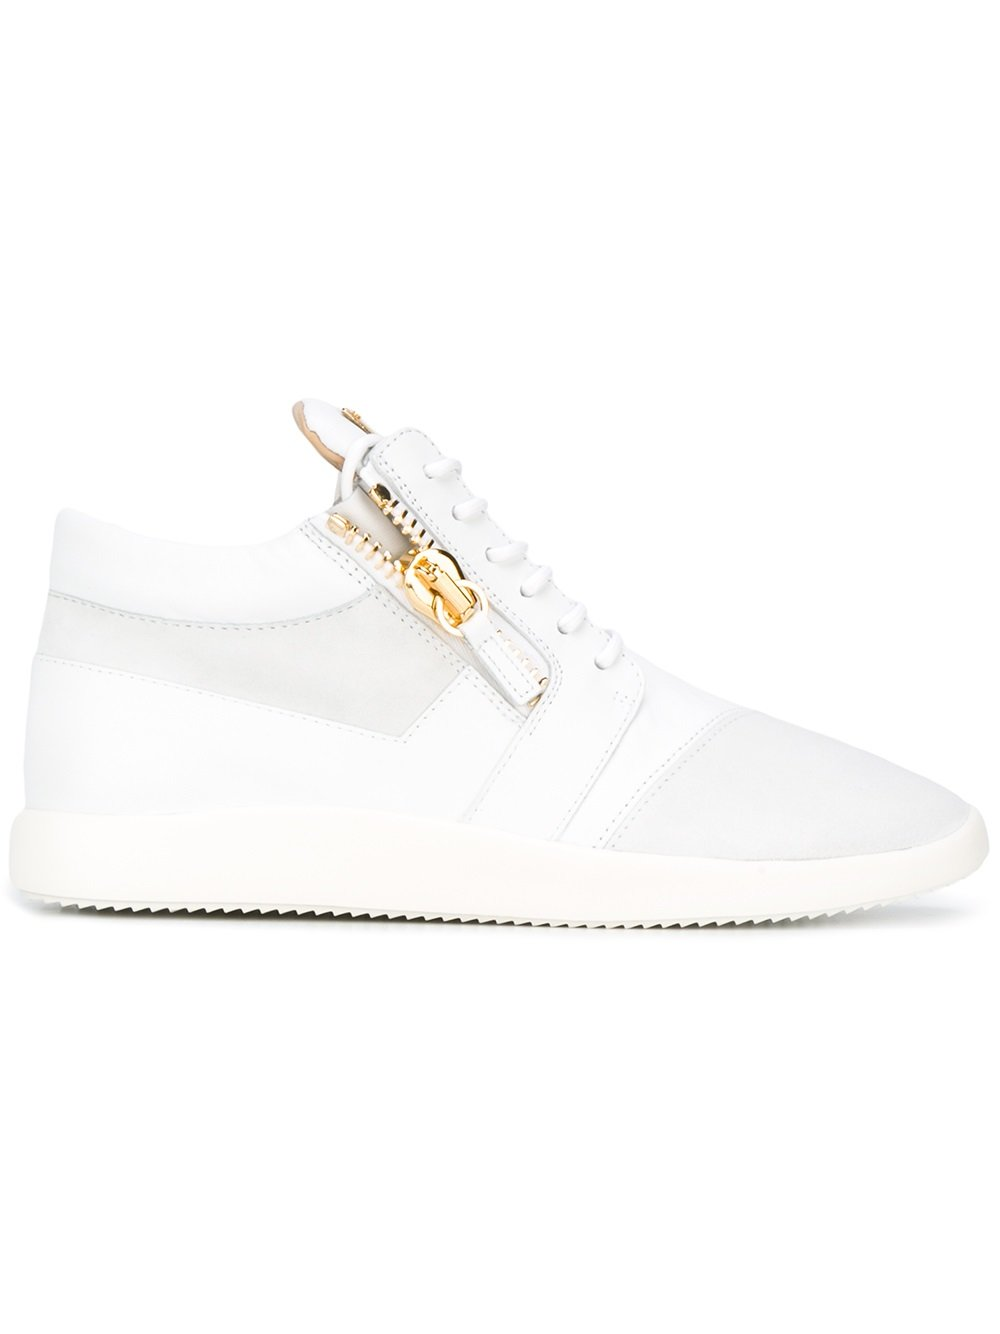 d6a8973c6a8 1000x1334 Giuseppe Zanotti Design The Shark 5.0 Sneakers White Men Shoes